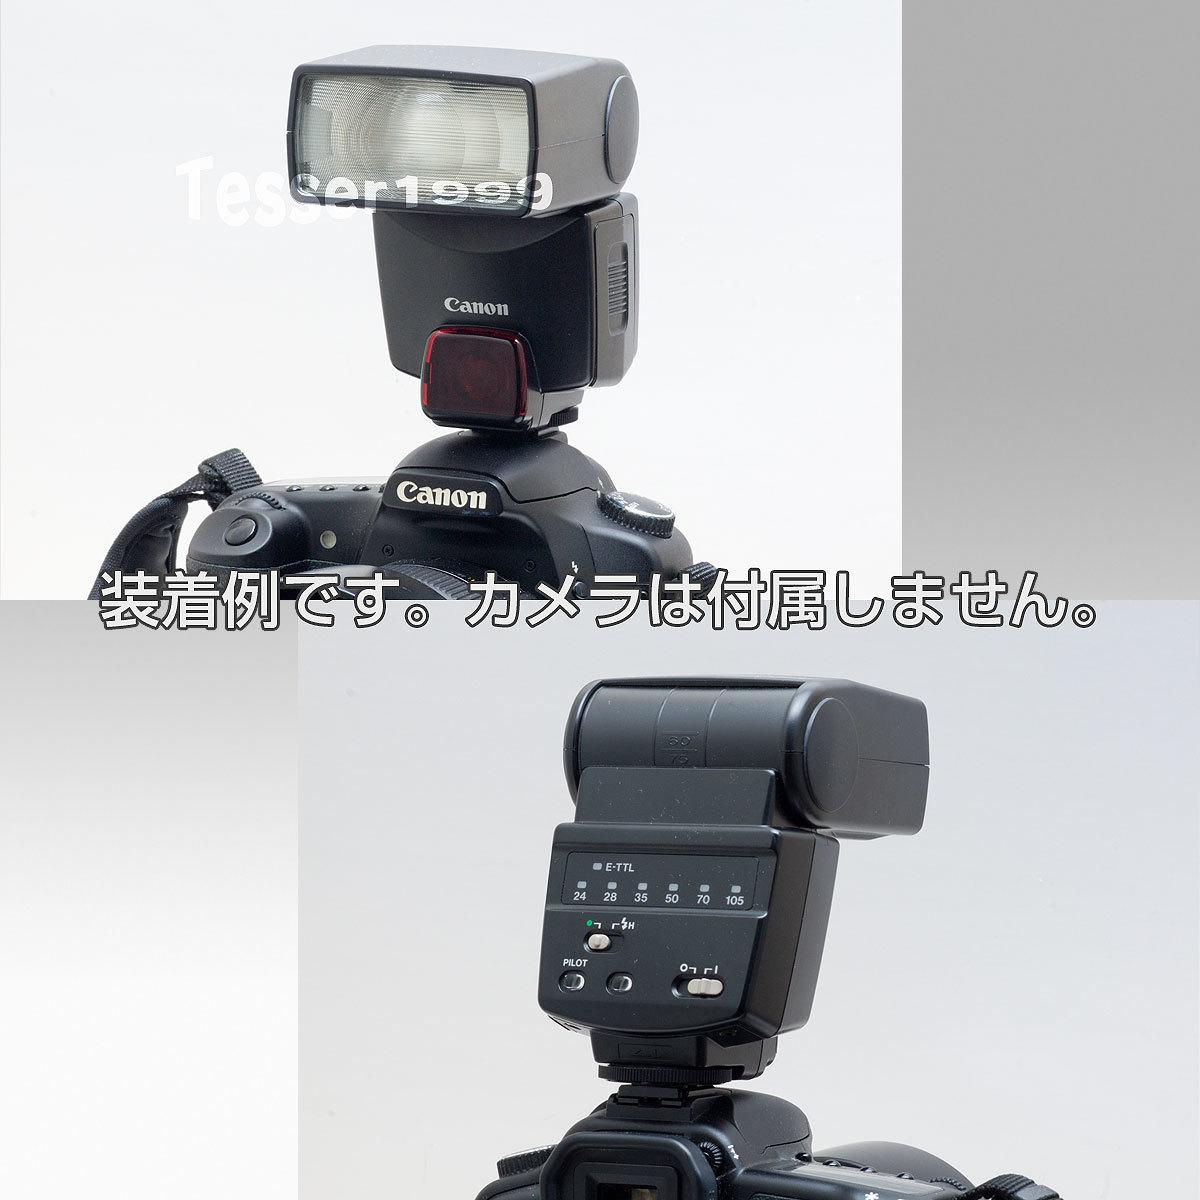 Canon SPEEDLITE 380EX デジタル・フィルム対応 動作OK (管理番号0803)_画像4